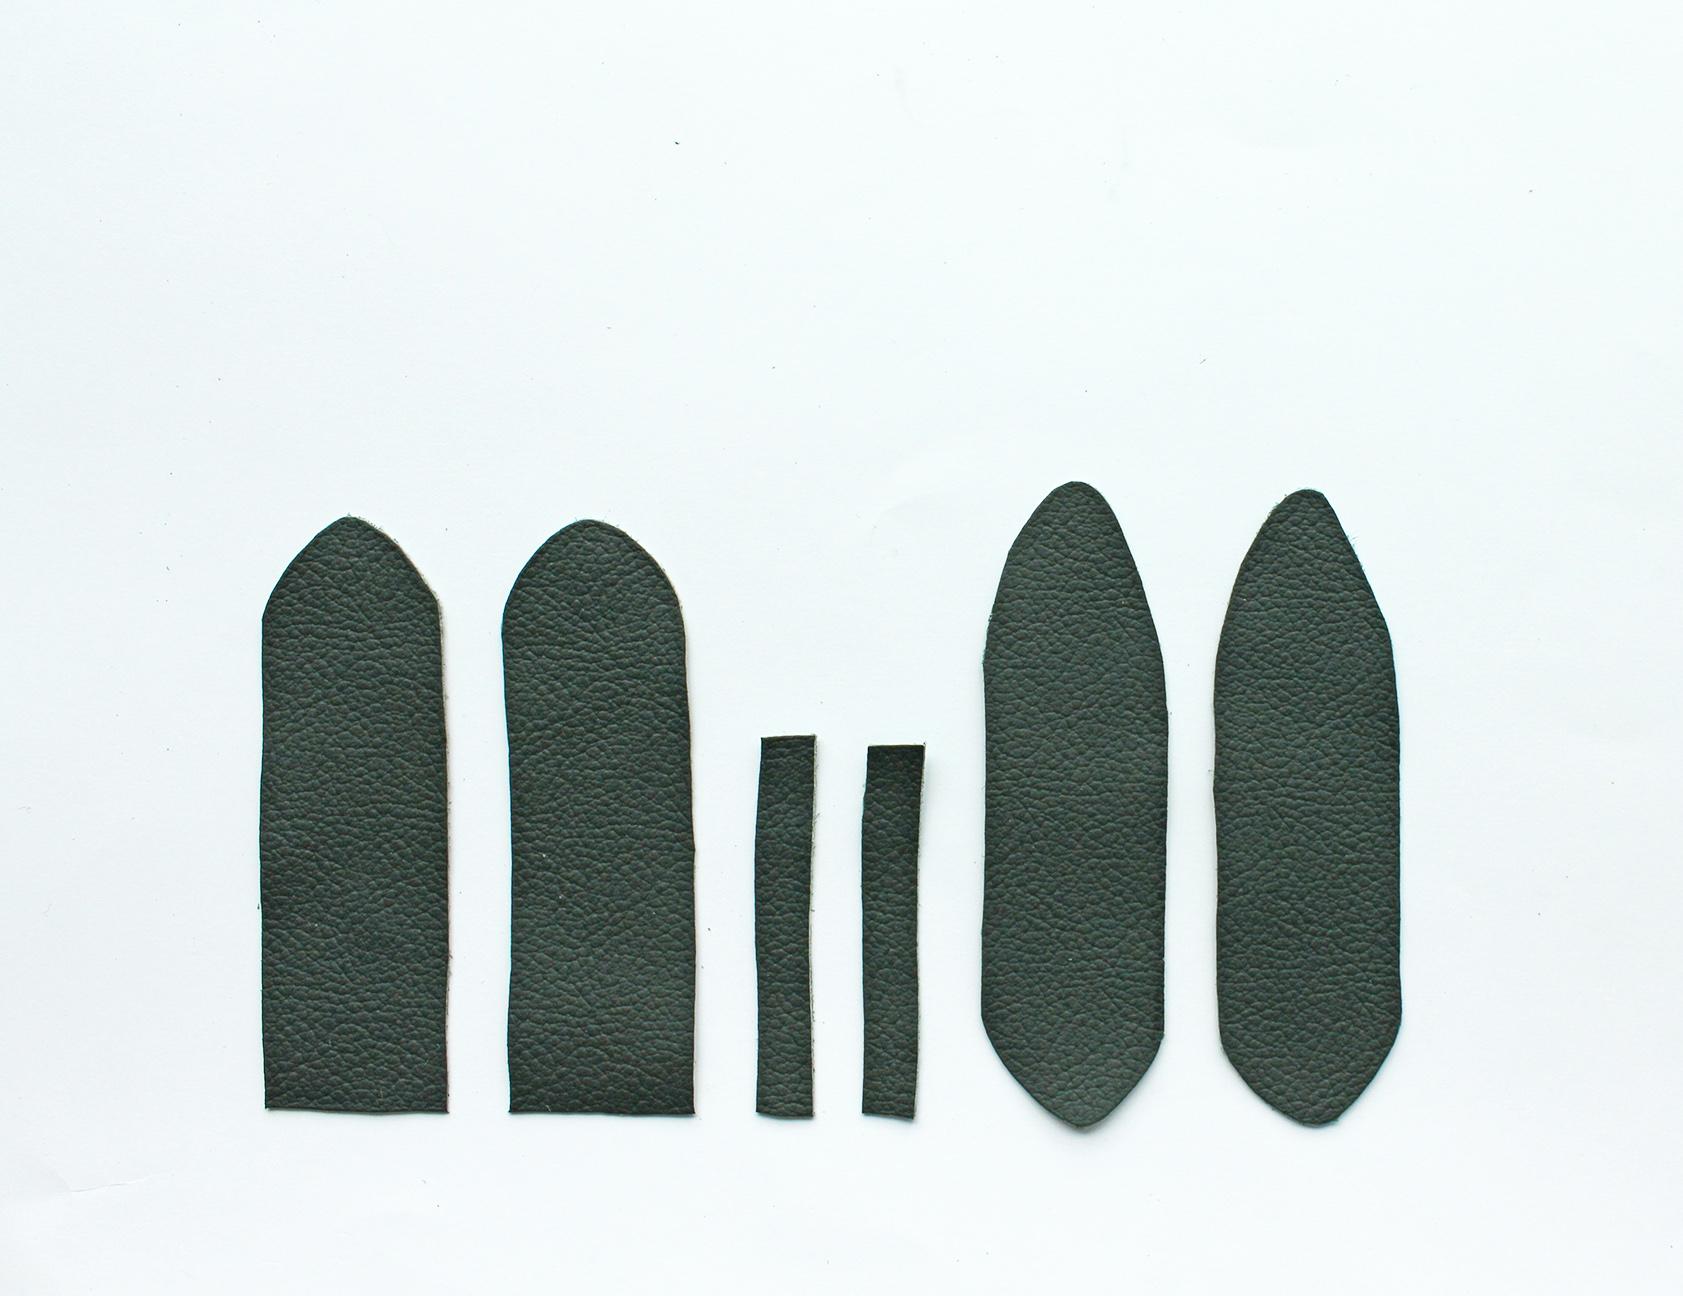 photo 2 Cut buckle leather.jpg